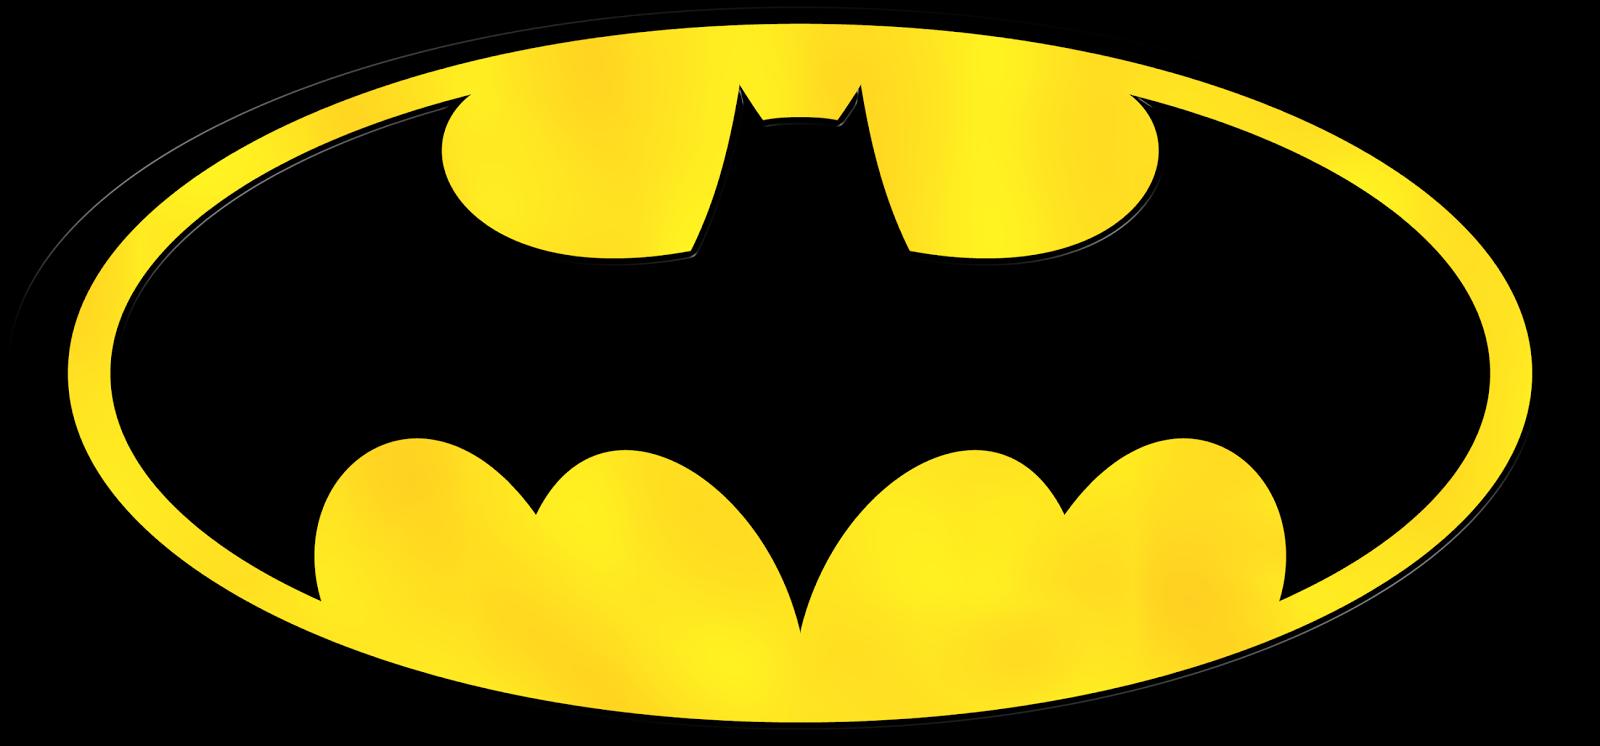 batman clipart at getdrawings com free for personal use batman